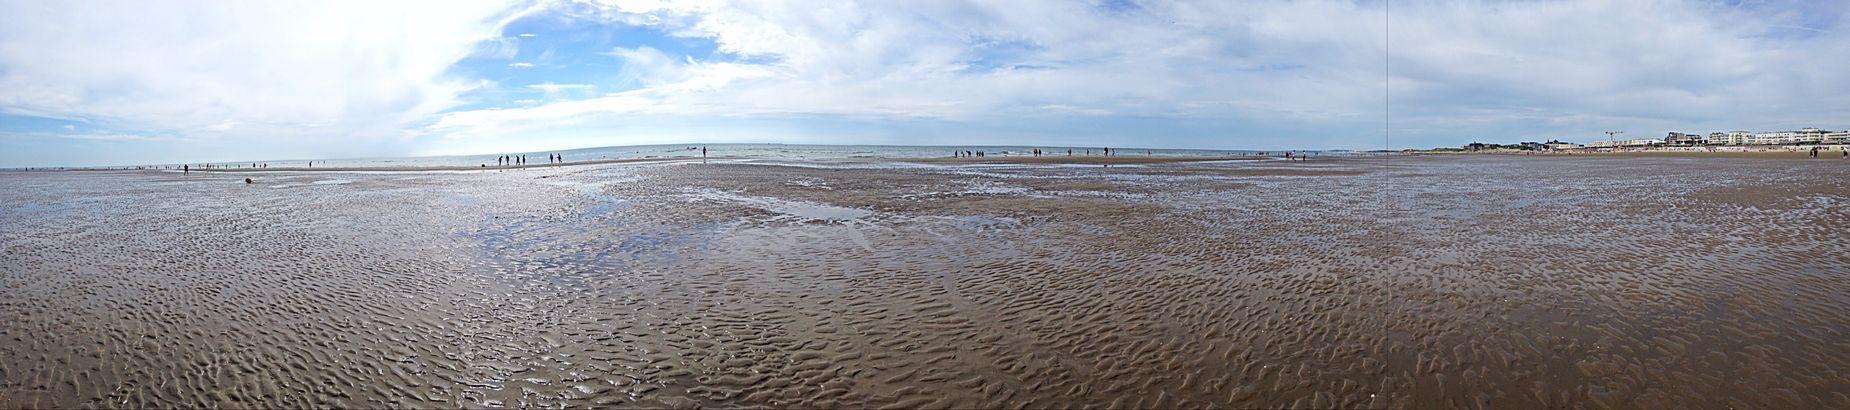 Beach Josephine Friends Beutiful  Water Berck Plage